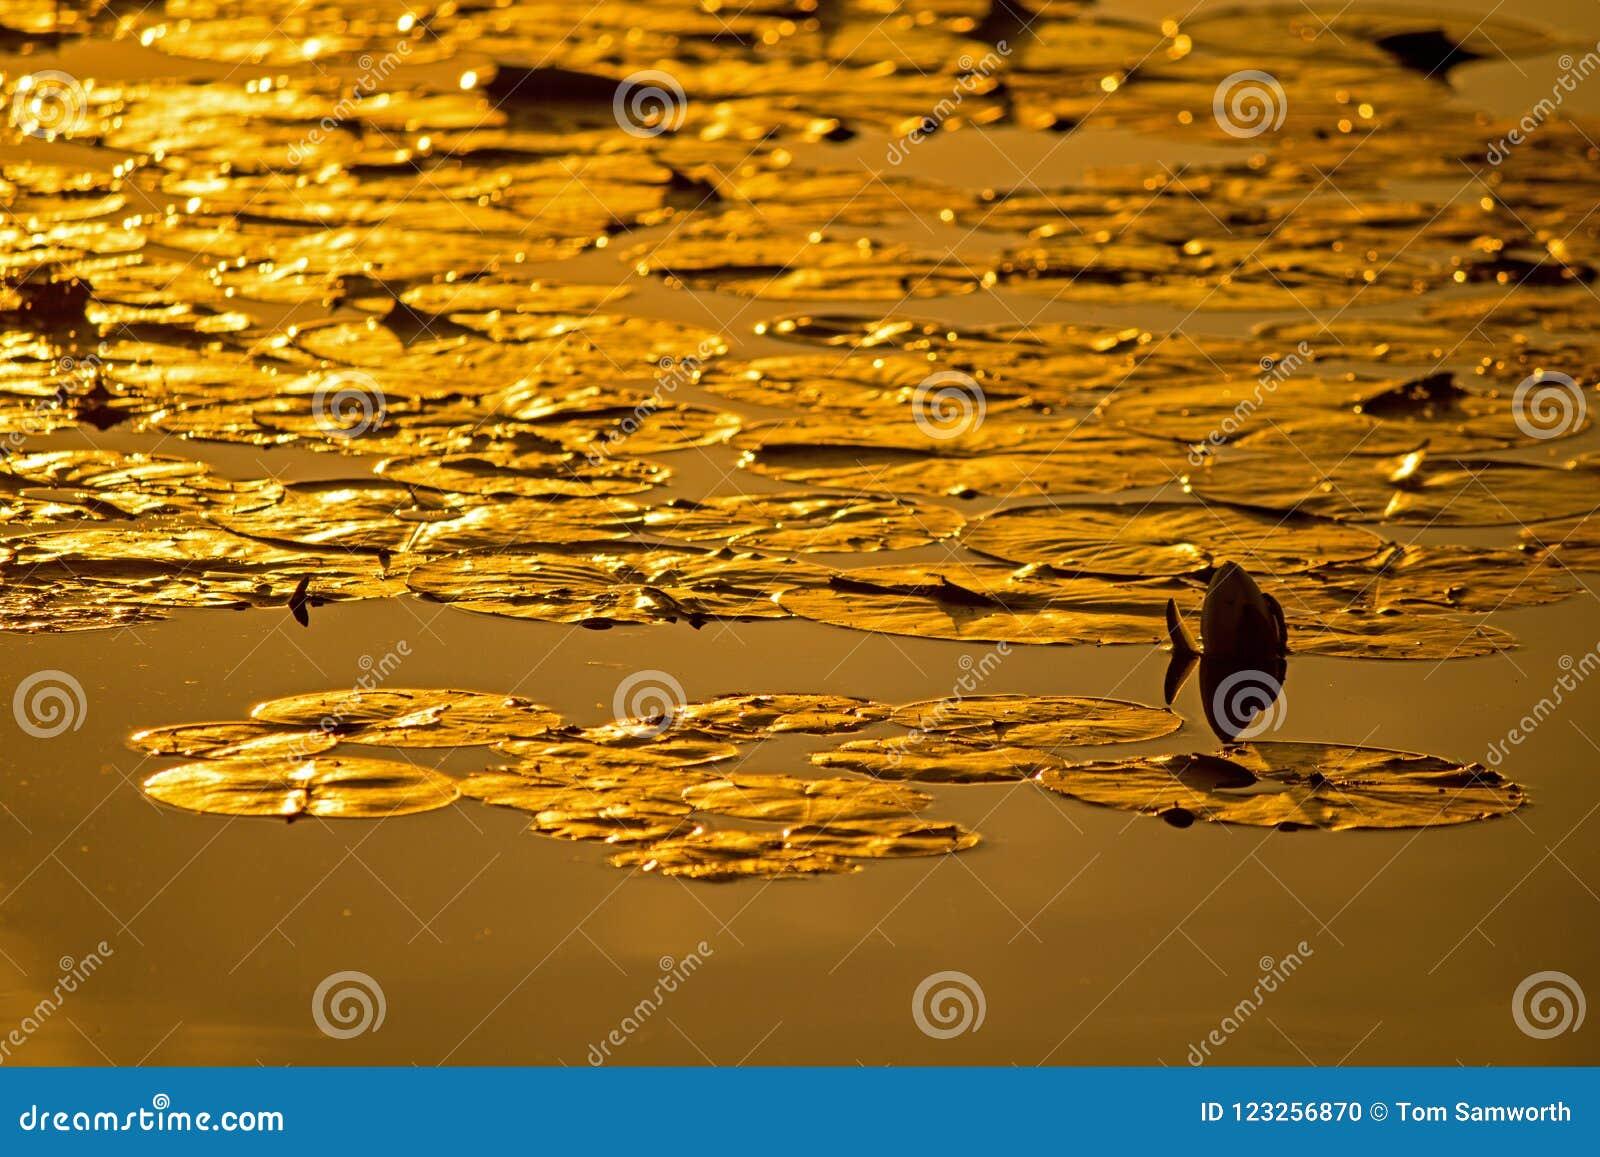 Lily Pads In The Golden-Licht des Sonnenuntergangs